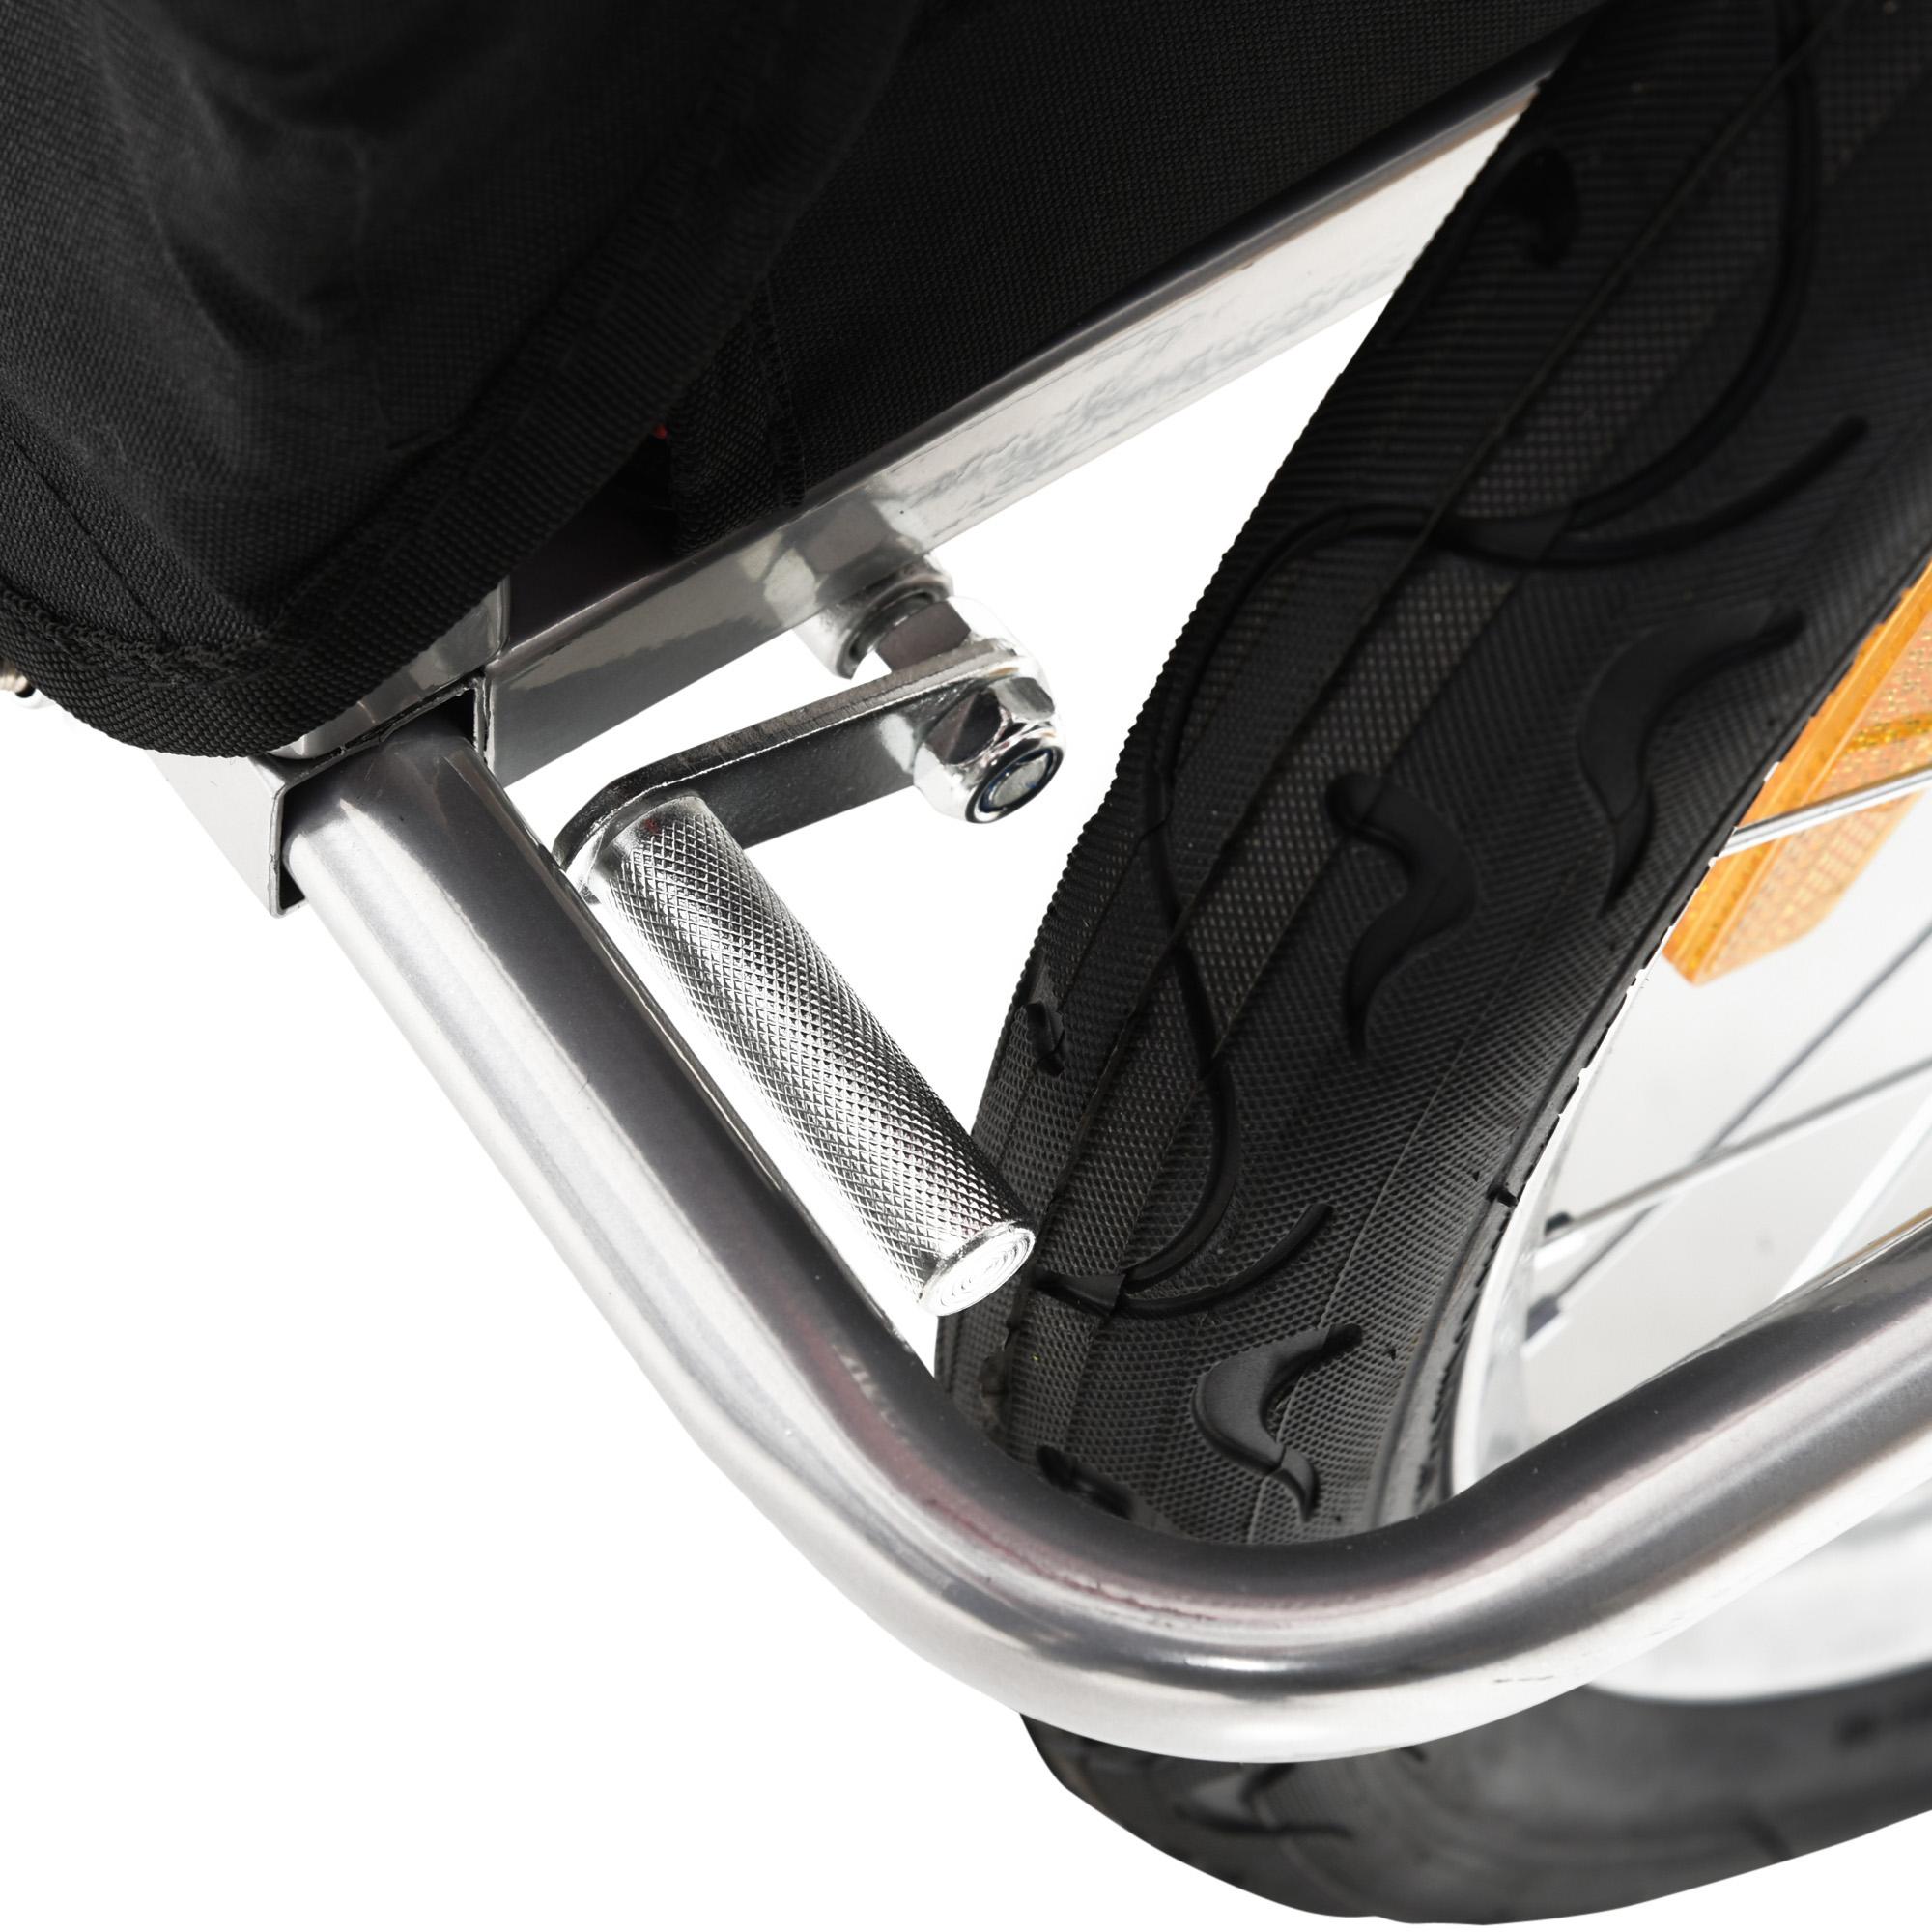 miniatura 33 - Remolque Bicicleta Niño 2 PLAZAS+Amortiguador Kit Footing Freno Bandera Cubierta